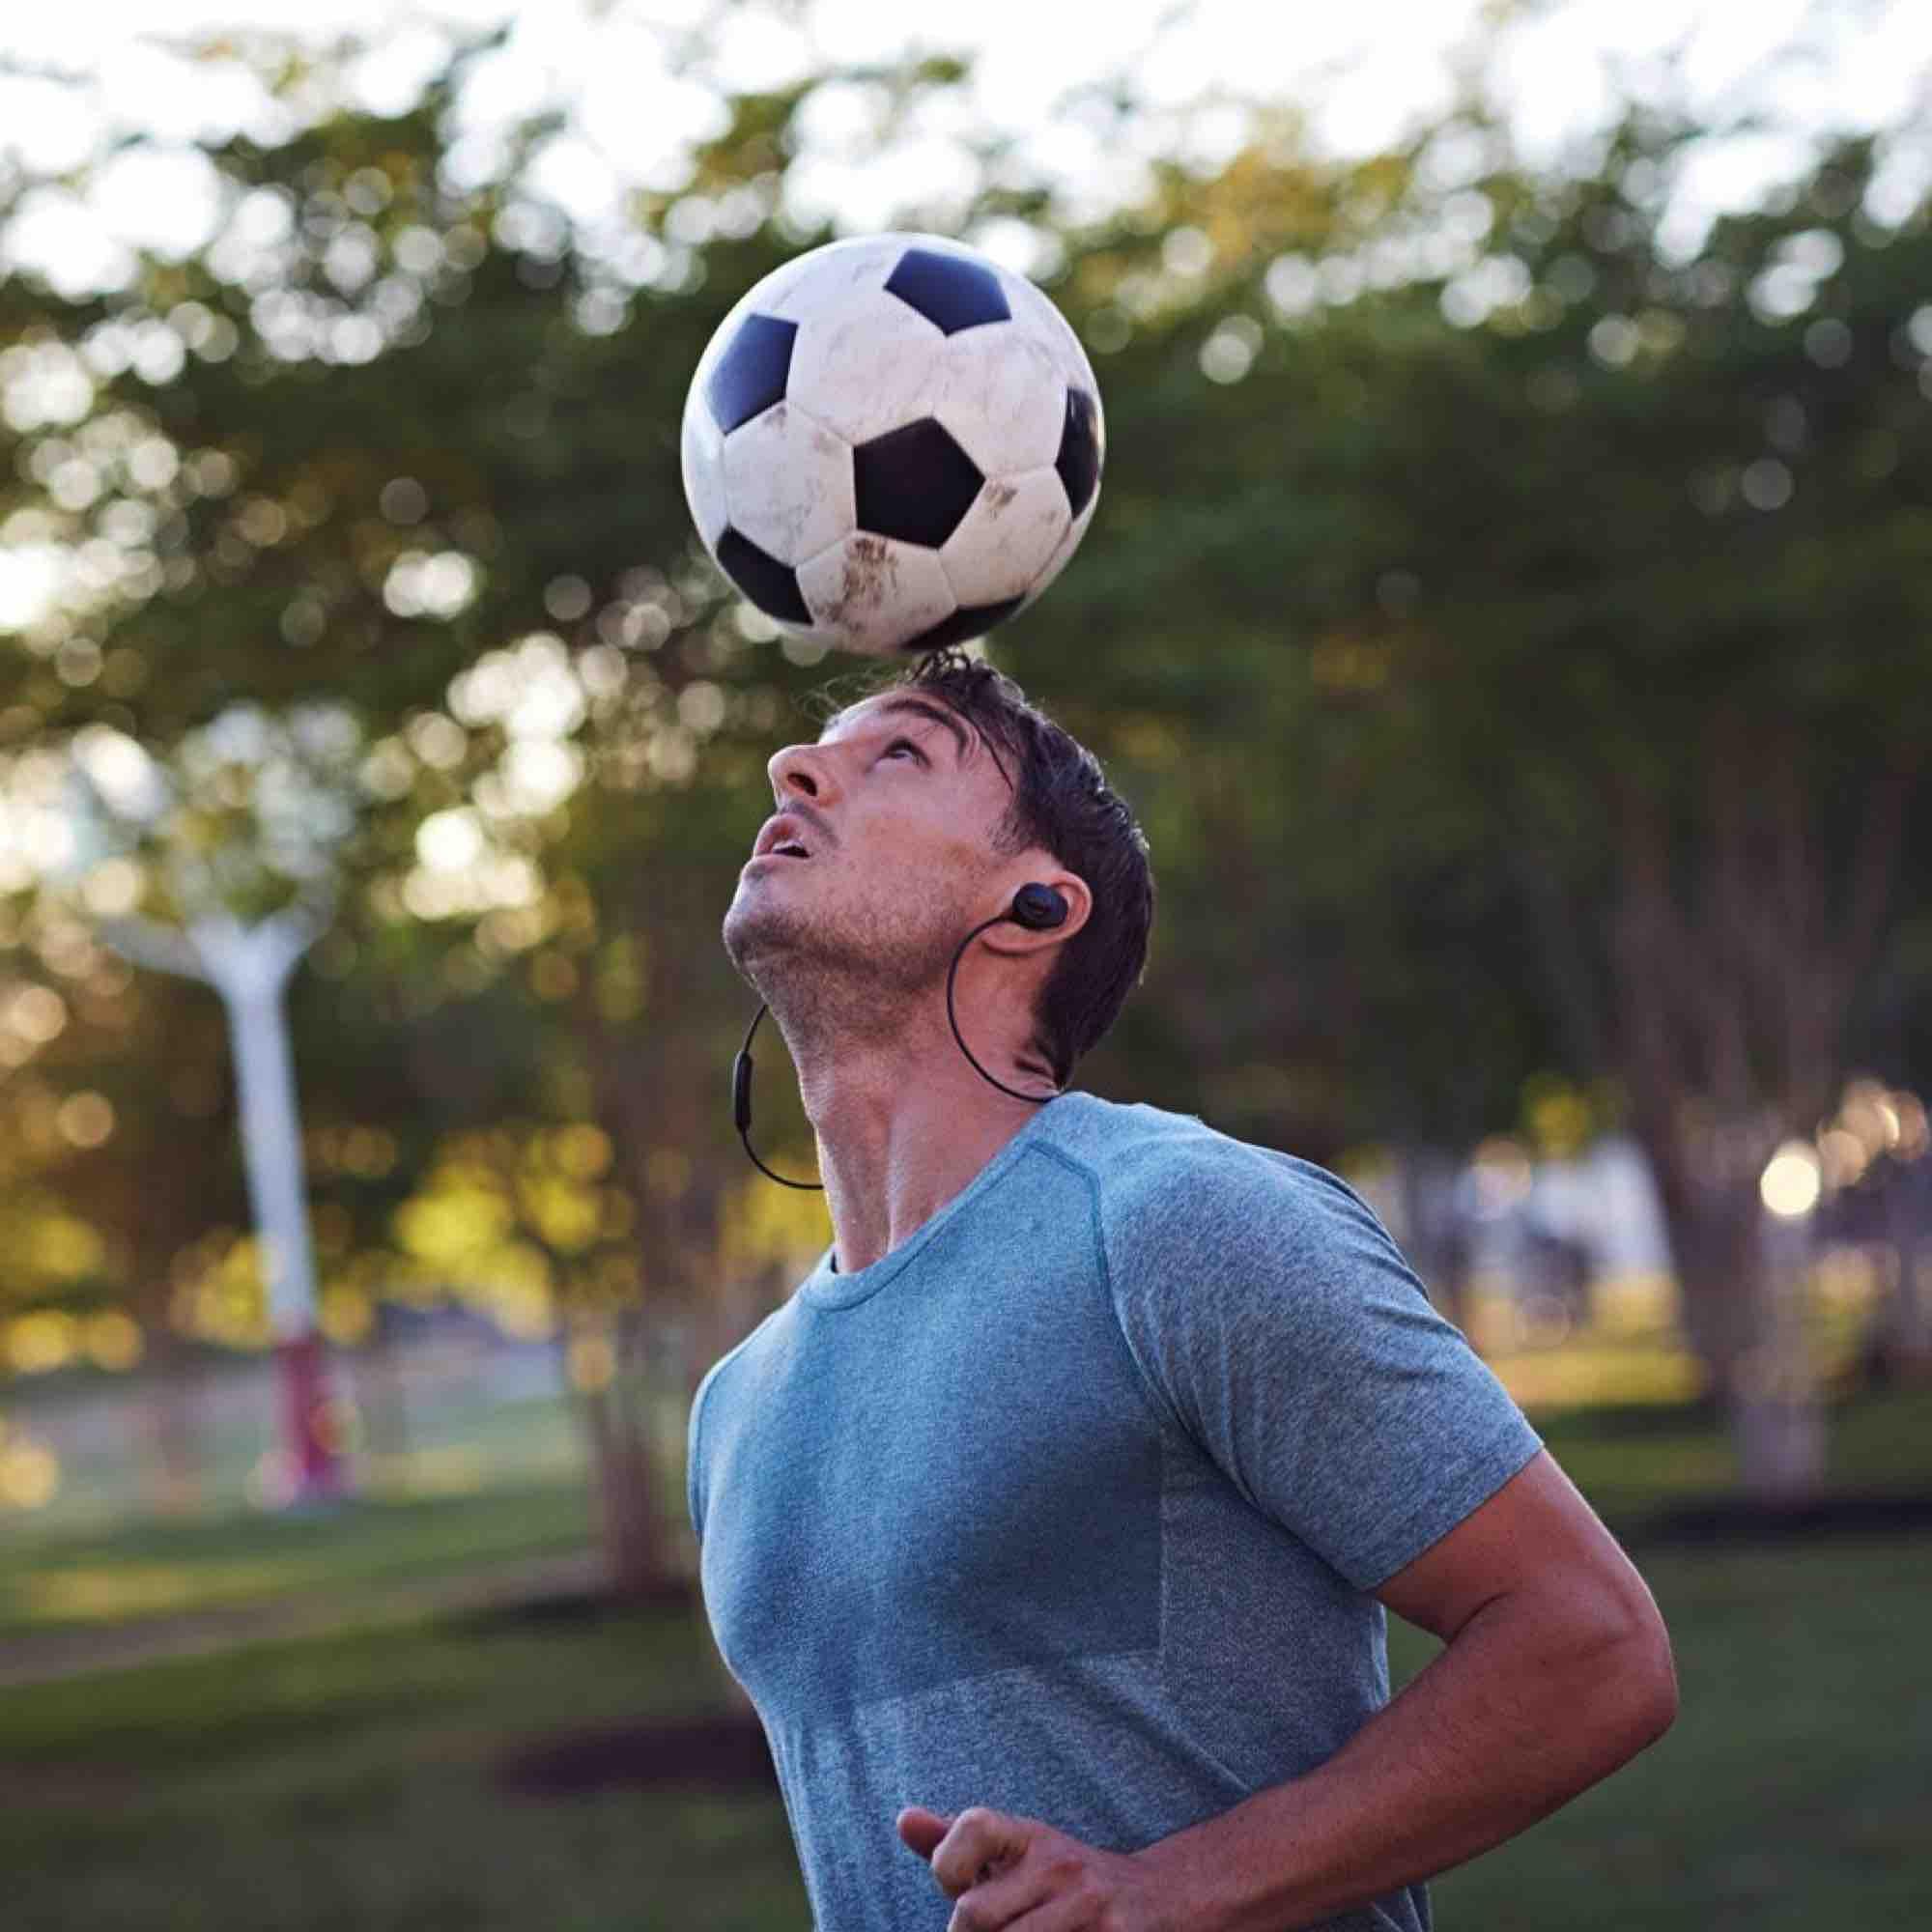 Bose SoundSport Pulse wireless draadloze sportoortjes met hartslagsensor